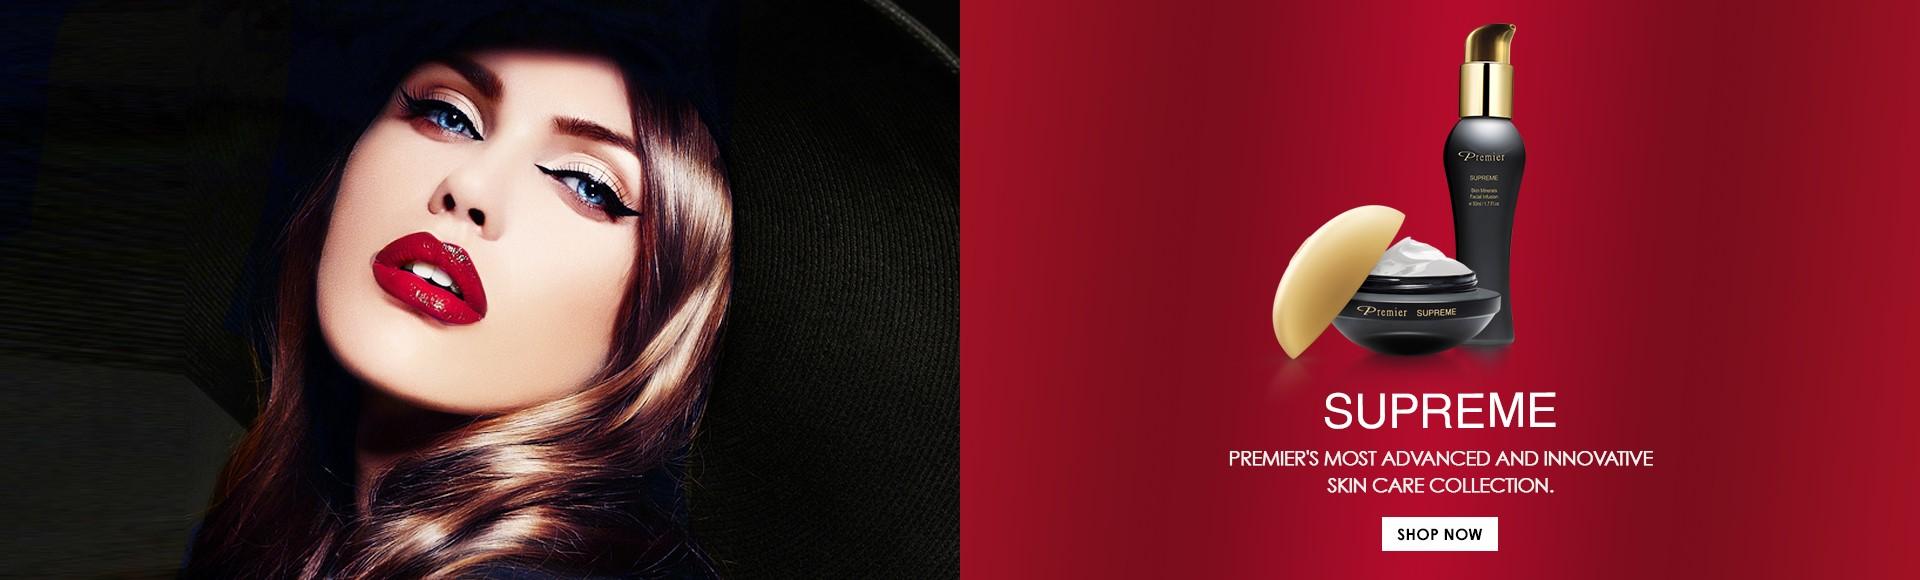 deadsea-premier.ro/